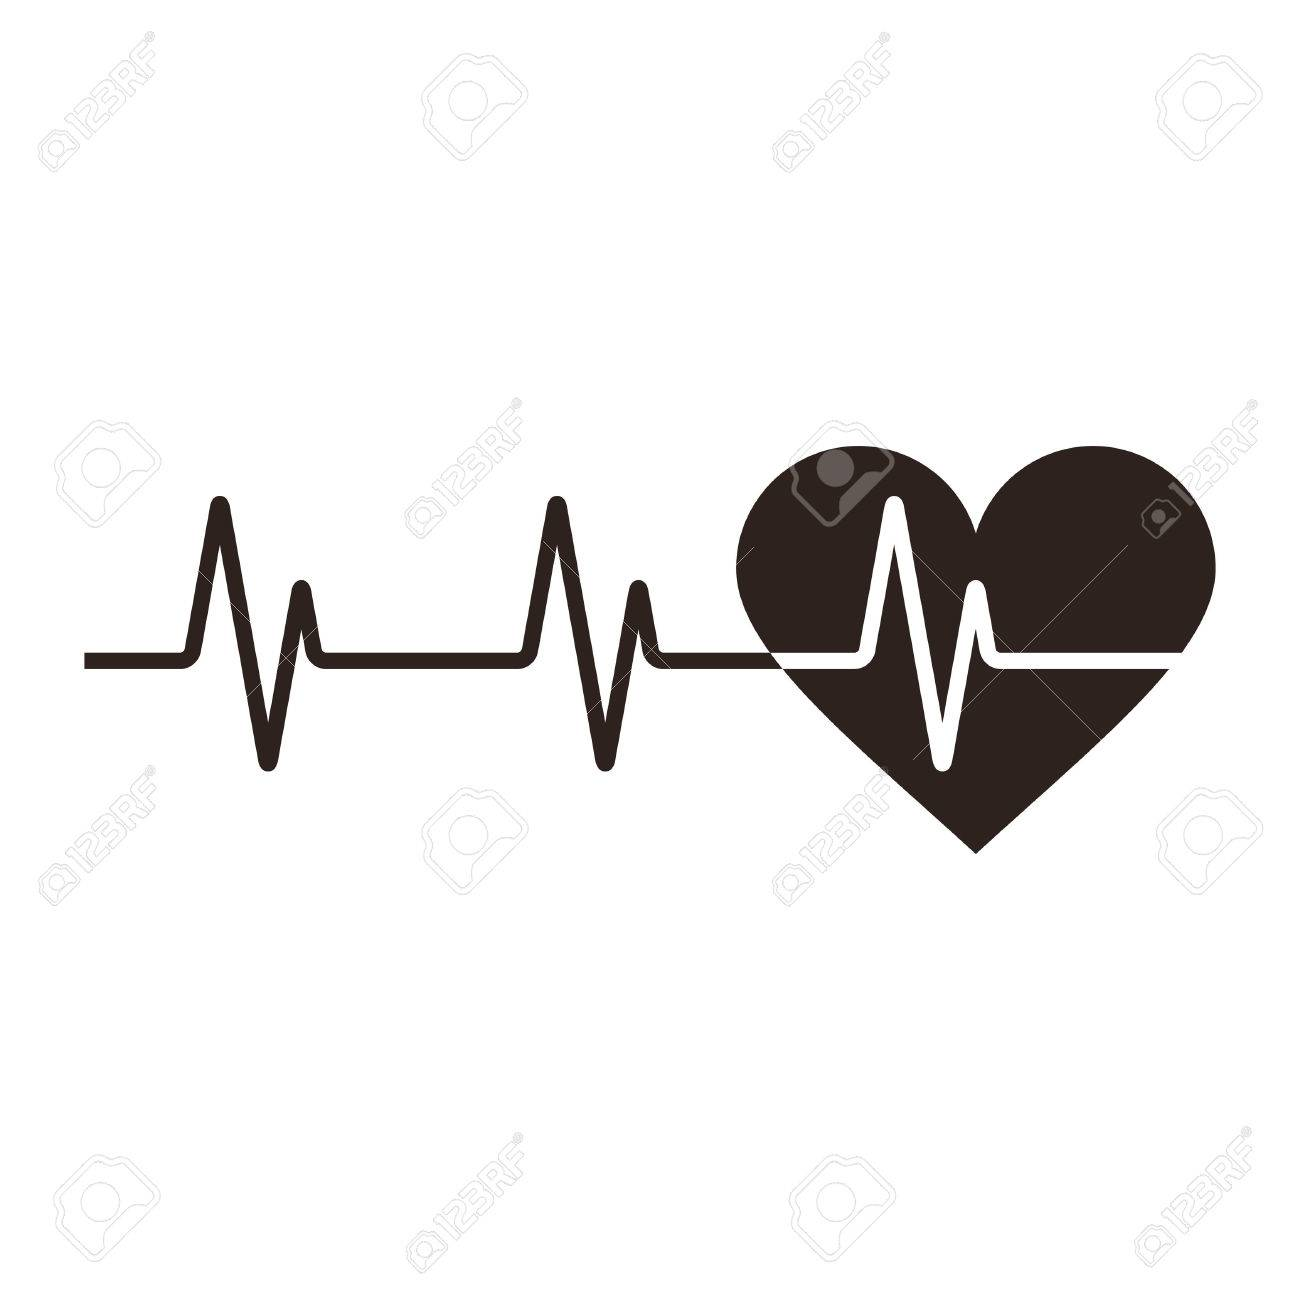 Heartbeat clipart ekg strip. Cliparts free download best